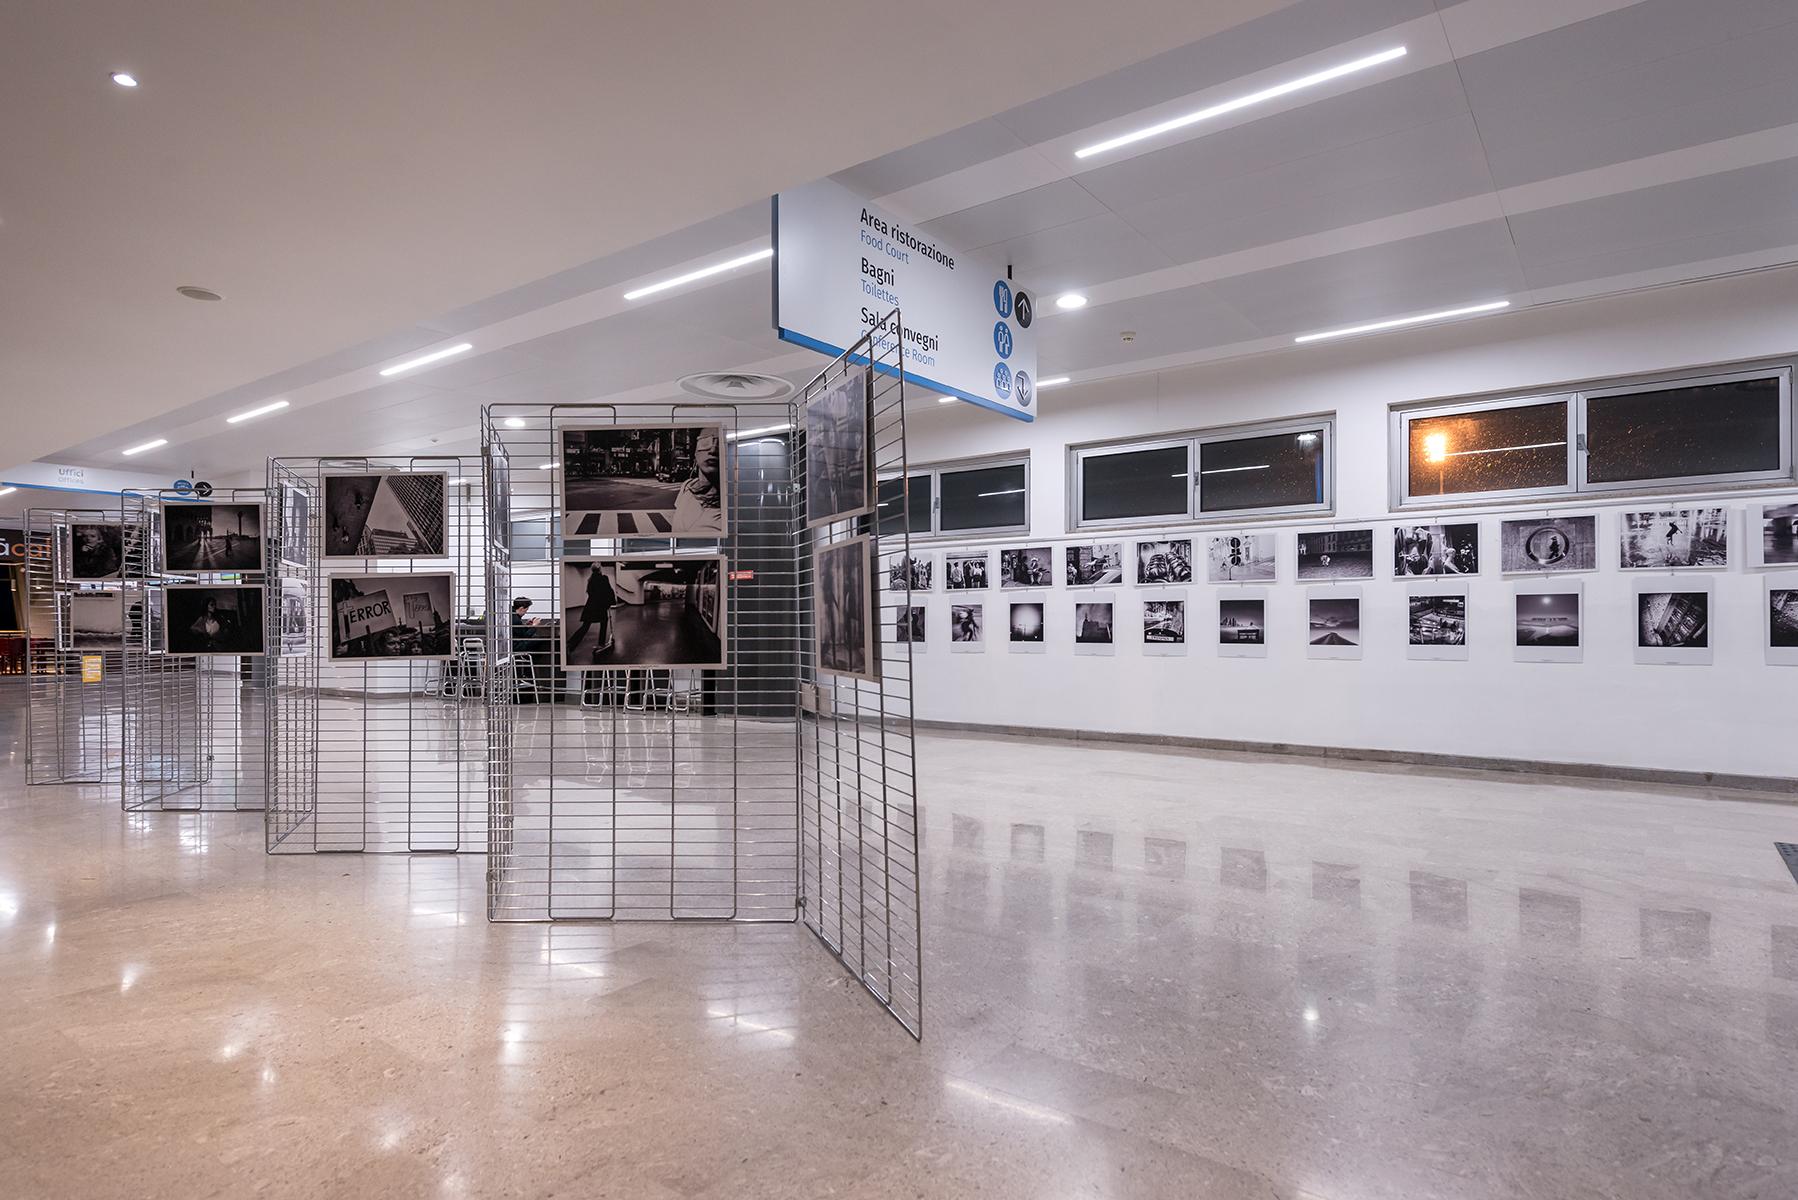 Trieste Airport04_800_8459